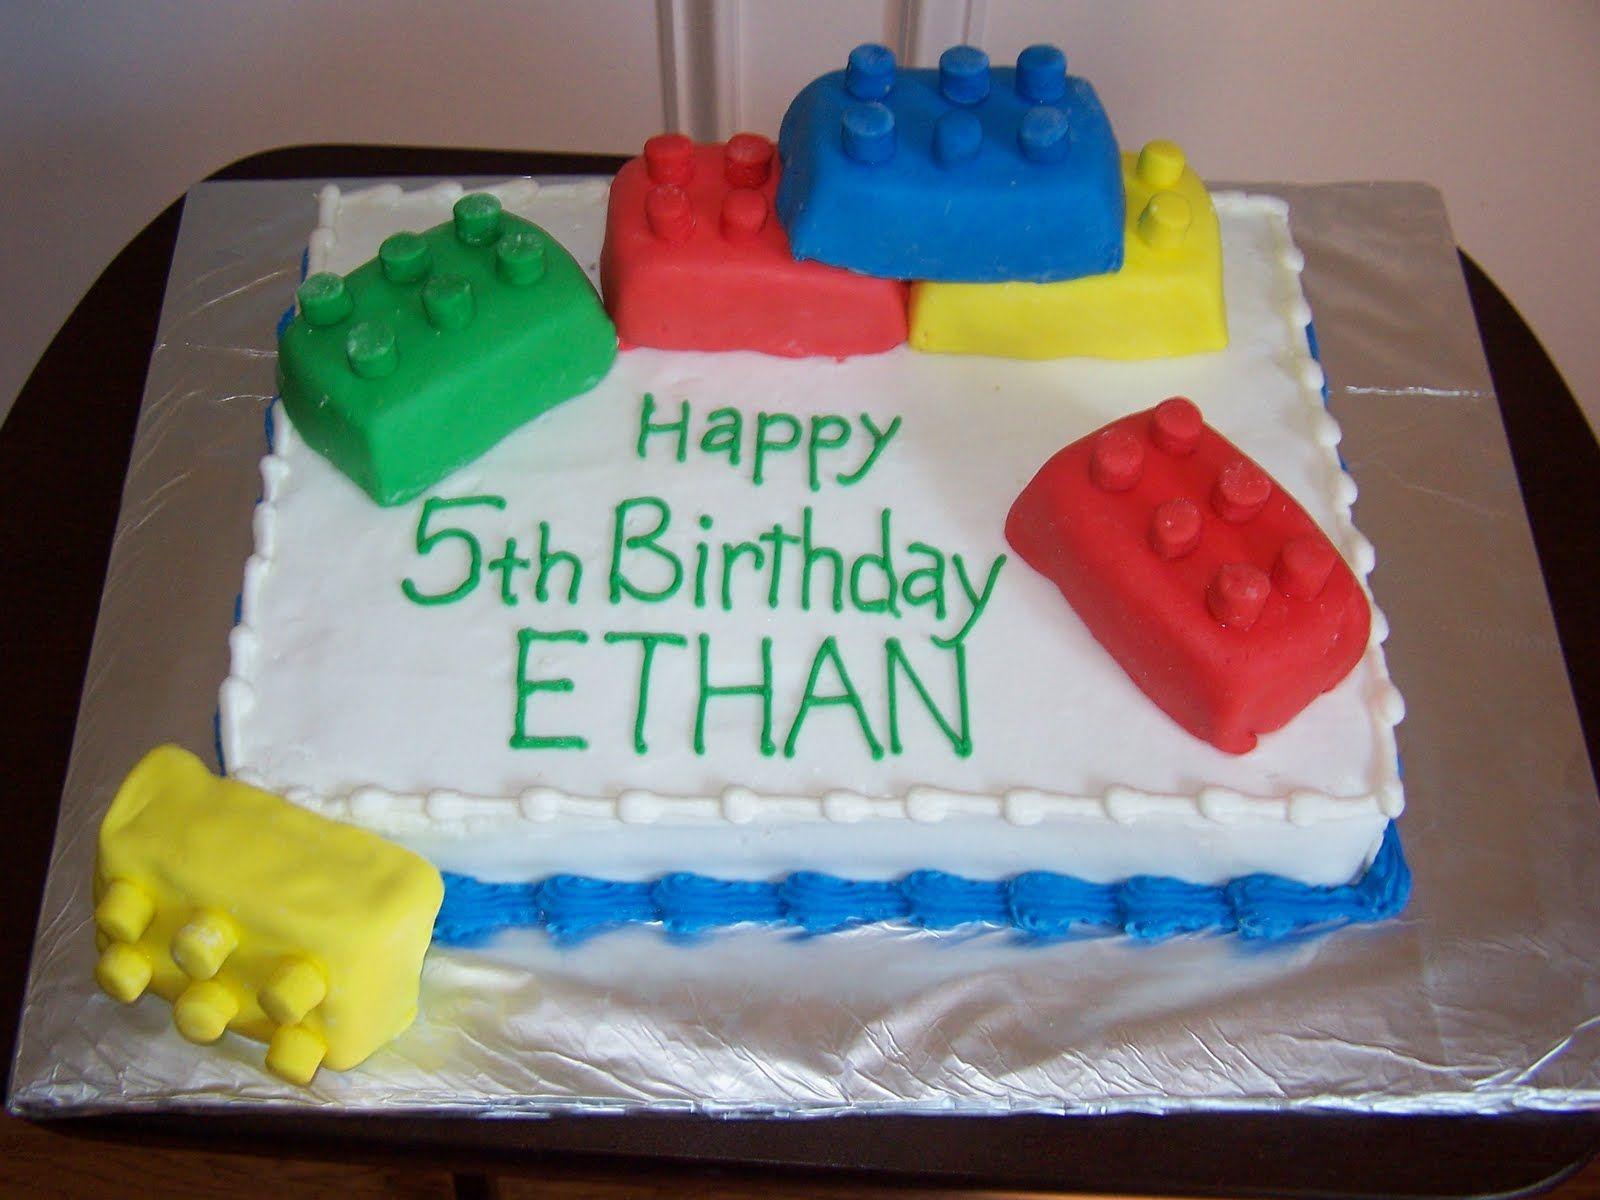 Birthday Cakes Asda In Store ~ Lego cake ideas for boys lego cake desserts pinterest